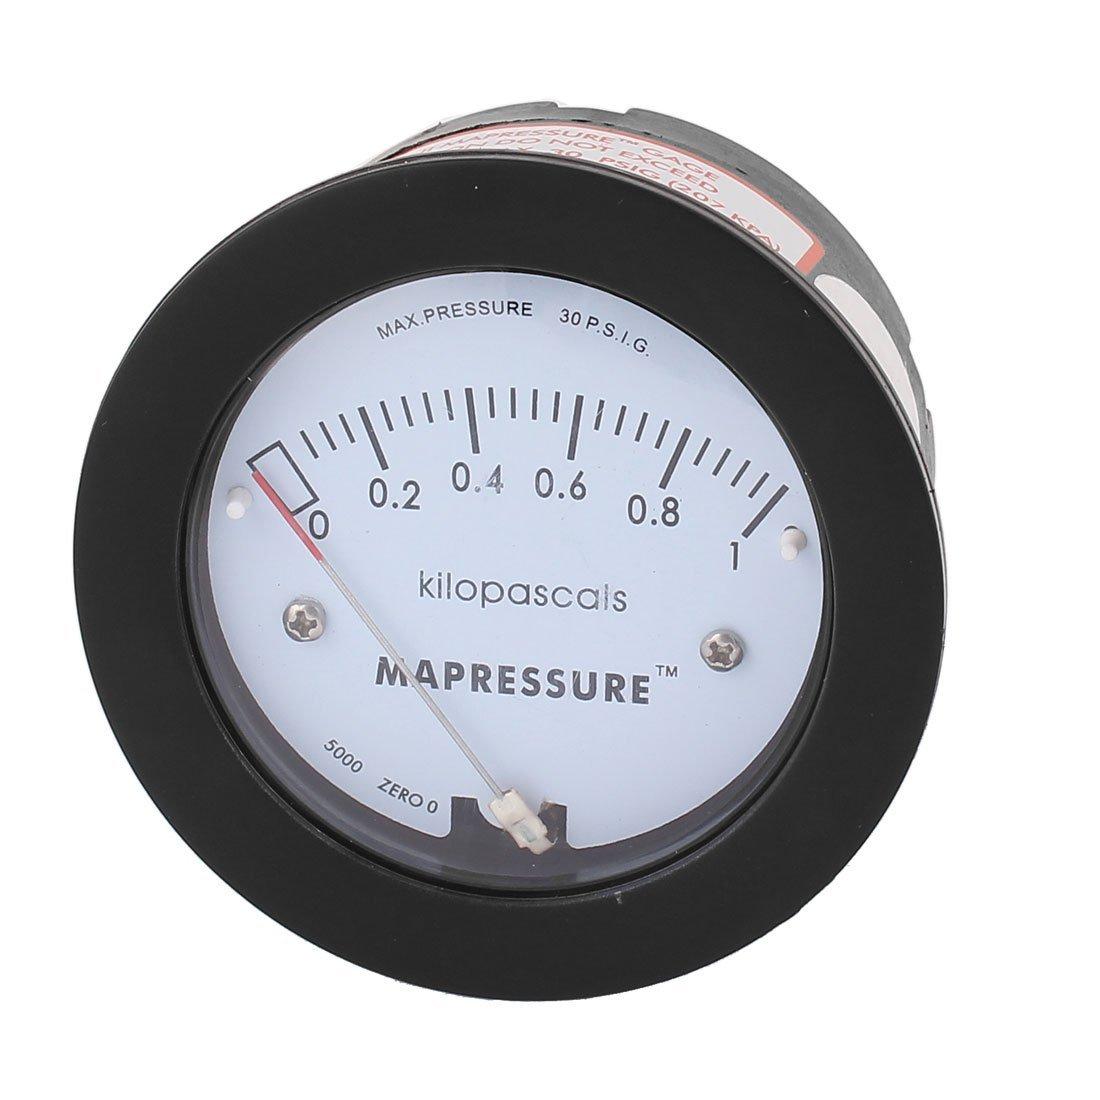 Serie 5000 0-1KPa 30 PSIG Differenzdruckmessgerät Meter DealMux